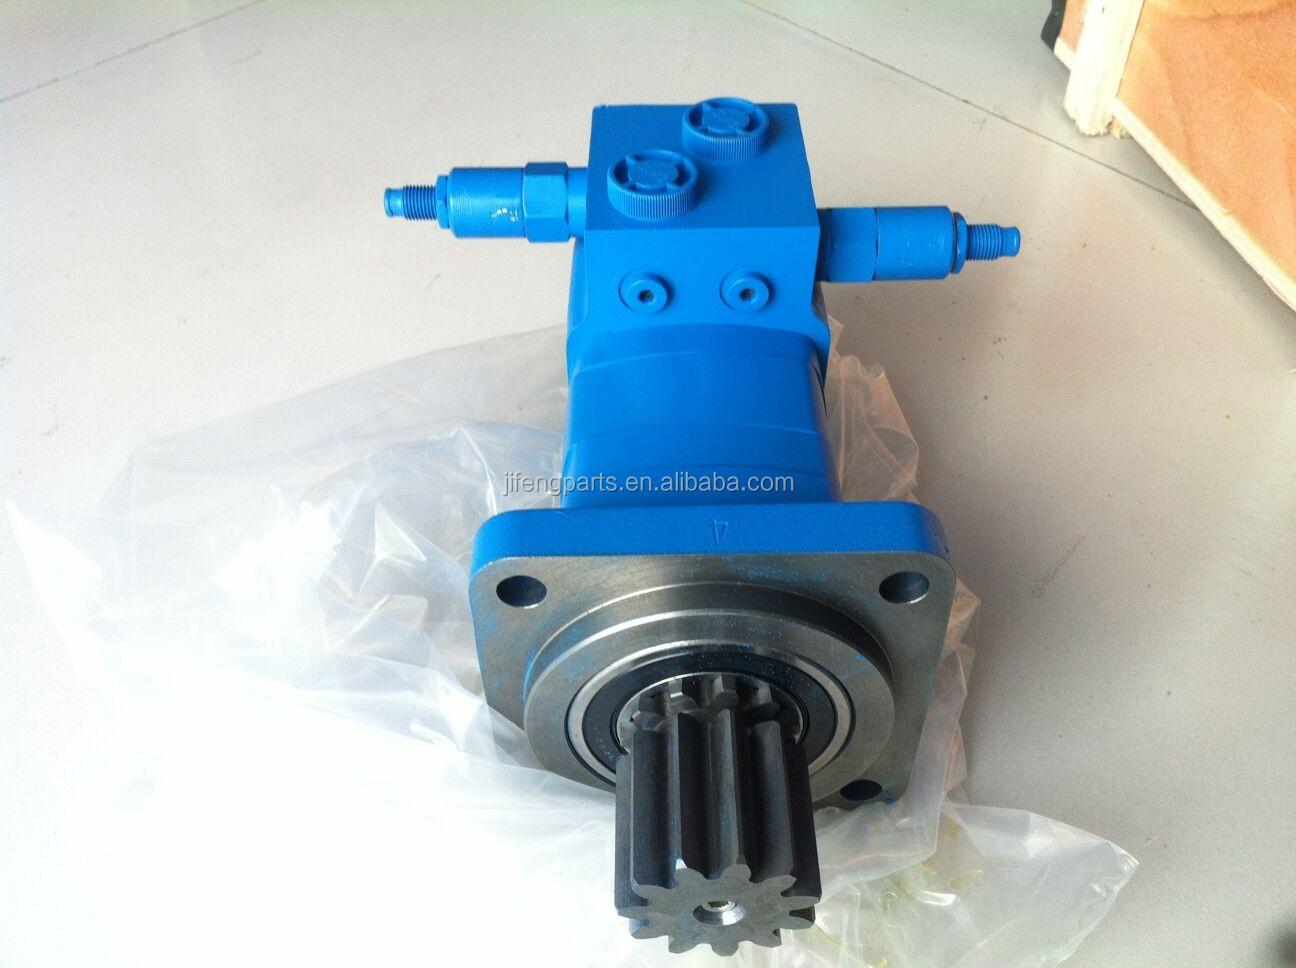 Eaton Hydraulic Motor For Yuchai Excavator Yc13 8 Buy